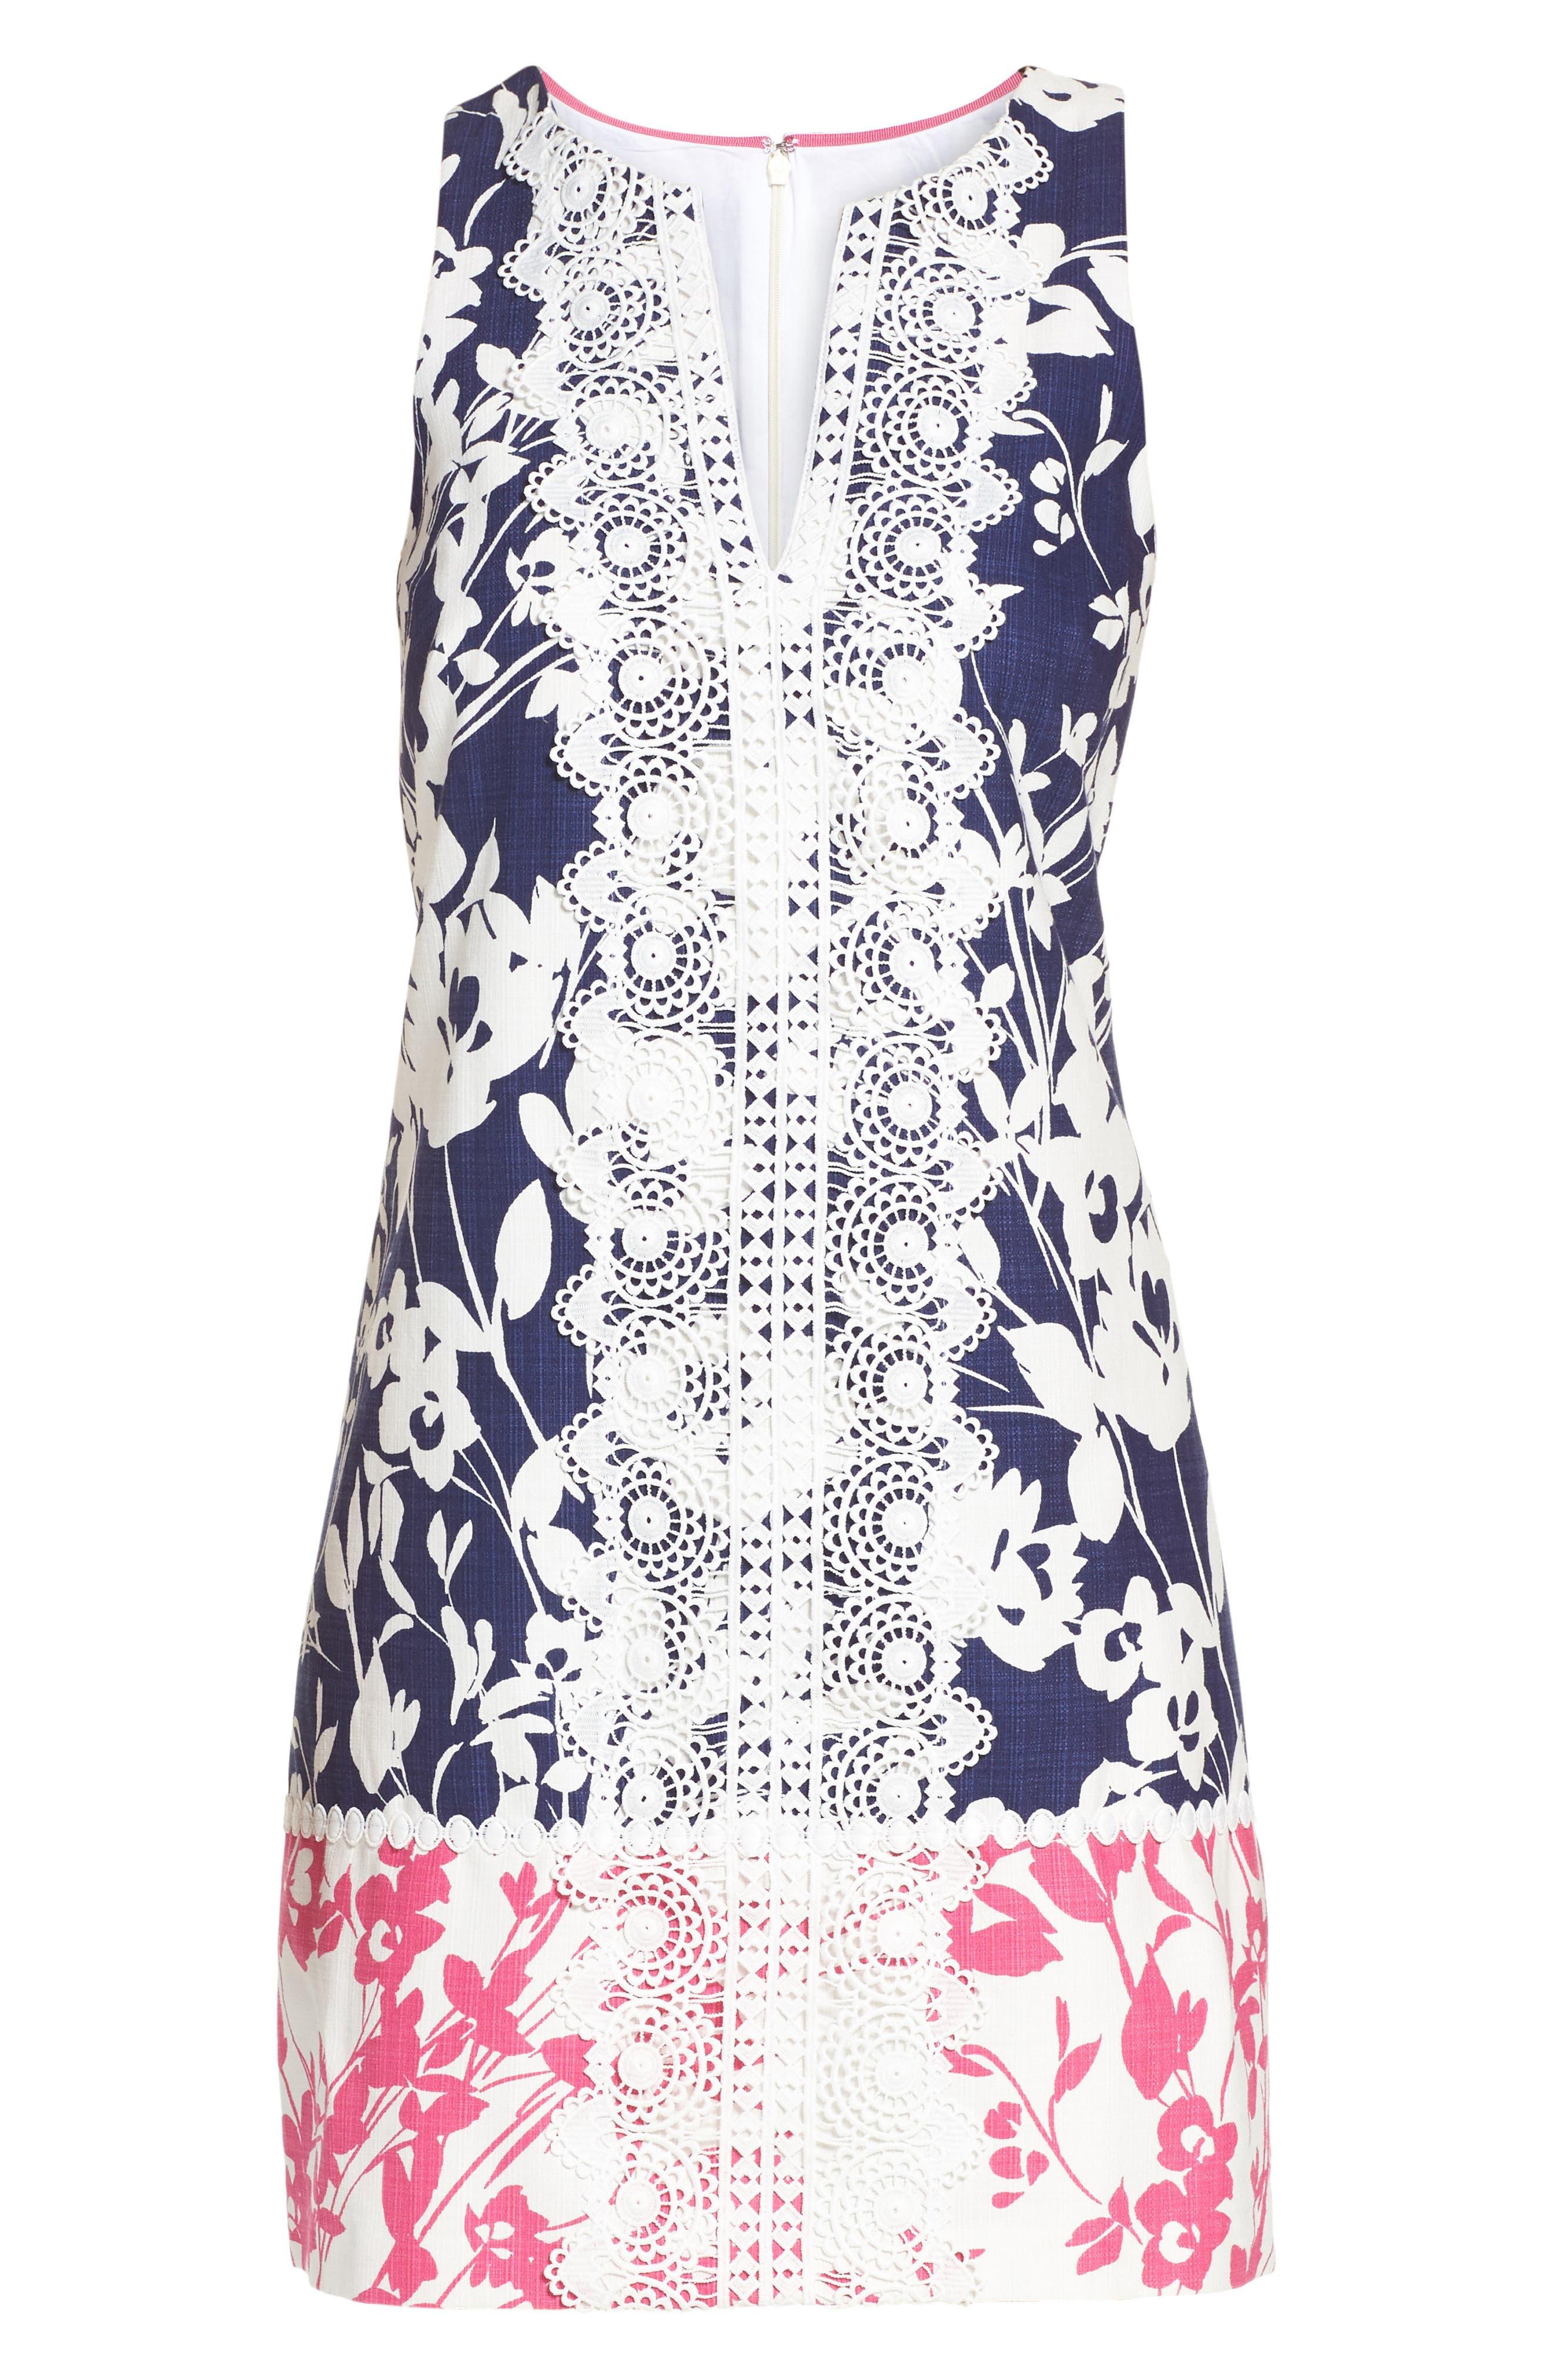 Stretch Cotton A-Line Dress,                             Alternate thumbnail 7, color,                             NAVY/ PINK